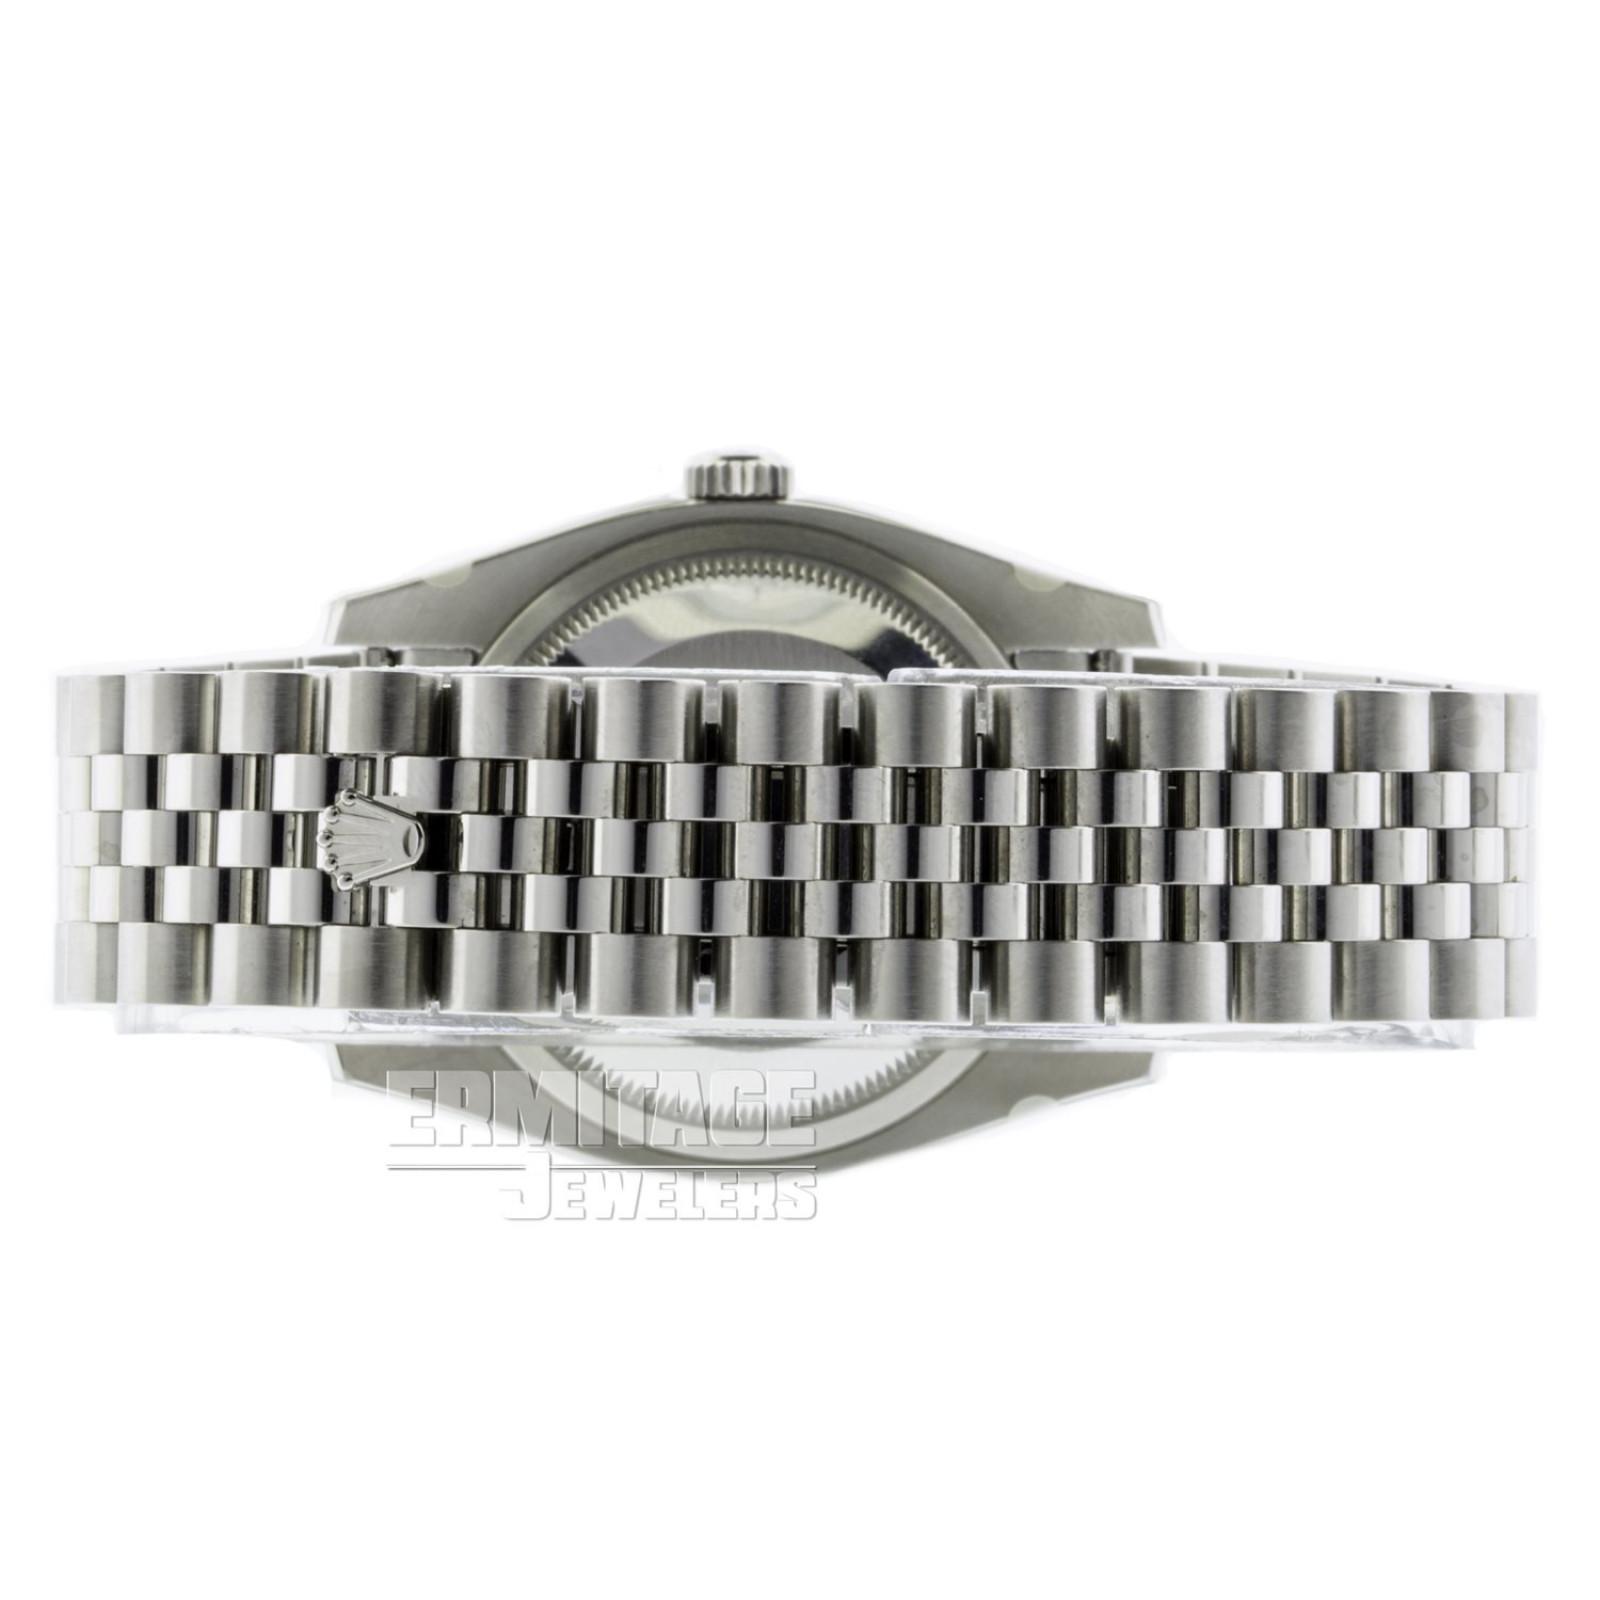 White Gold & Steel on Jubilee Rolex Datejust 116234 36 mm